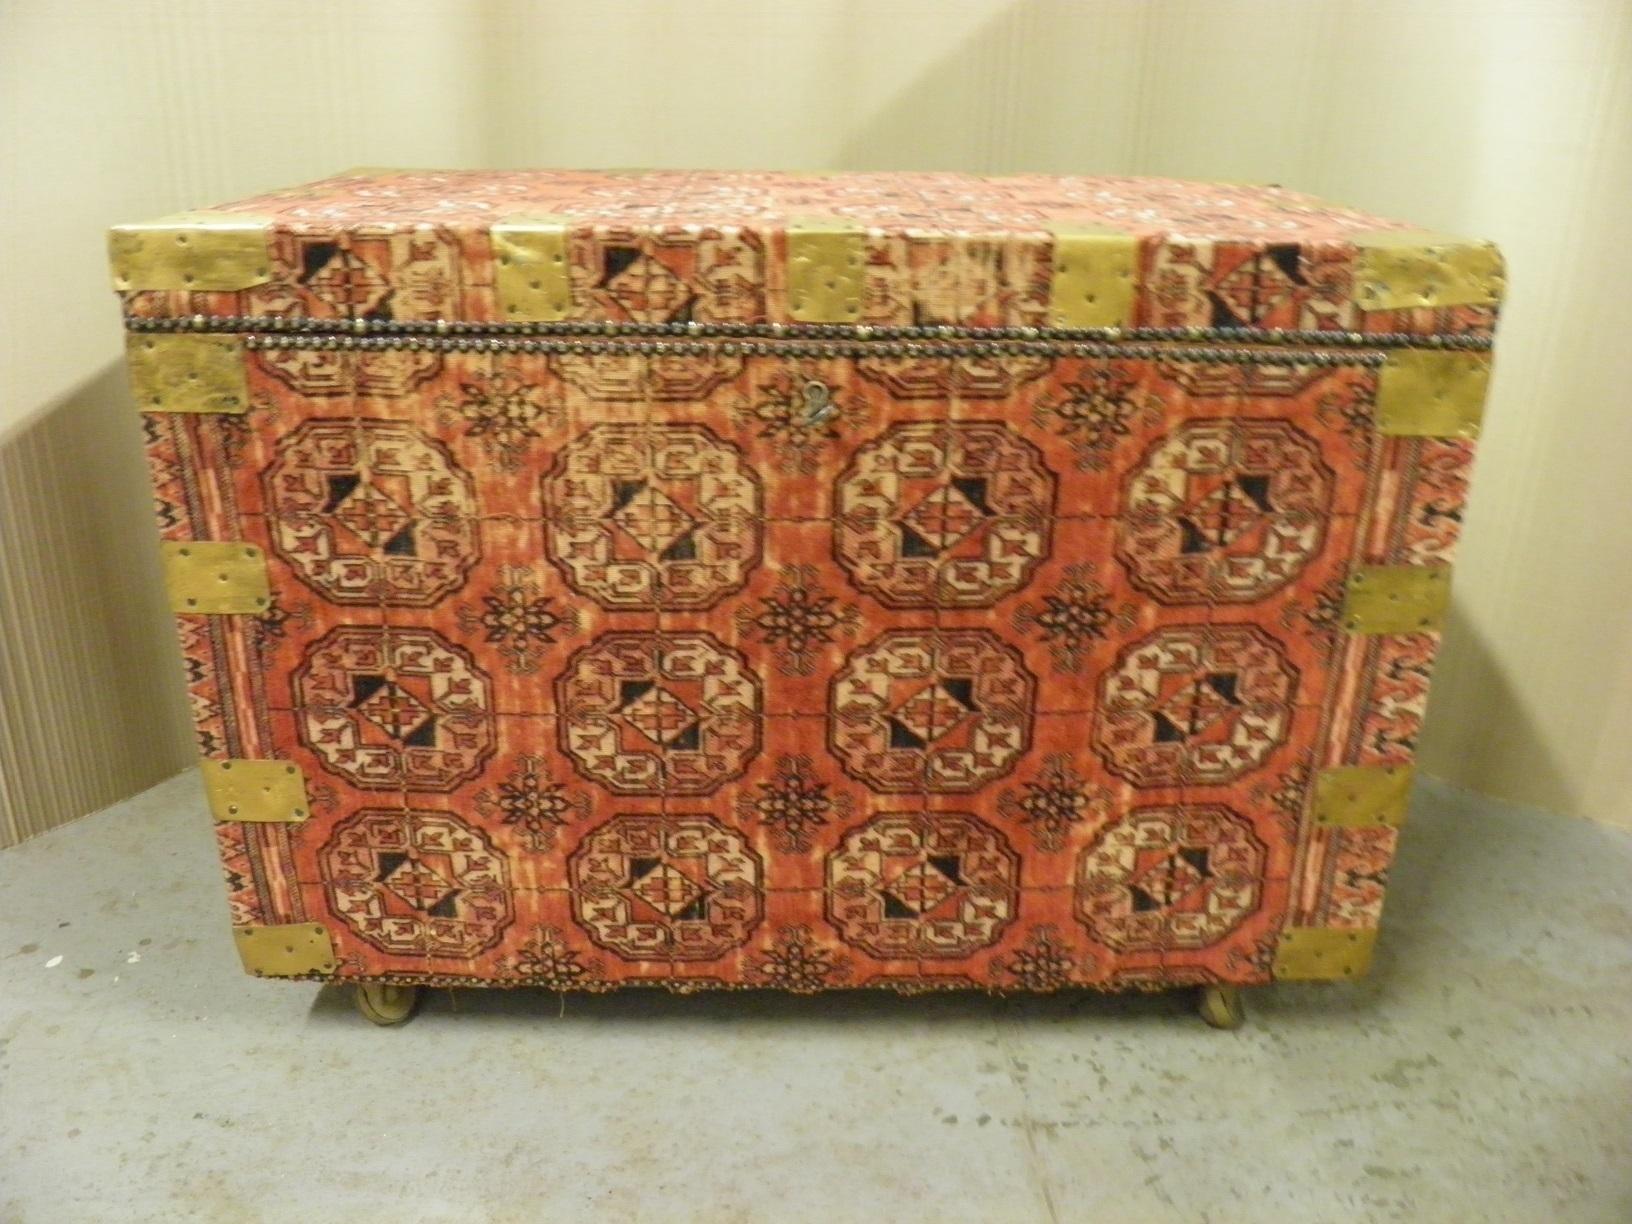 737f38da6 Antique 19th C. Decorative Pine Chest Covered In Vintage Belgian ...